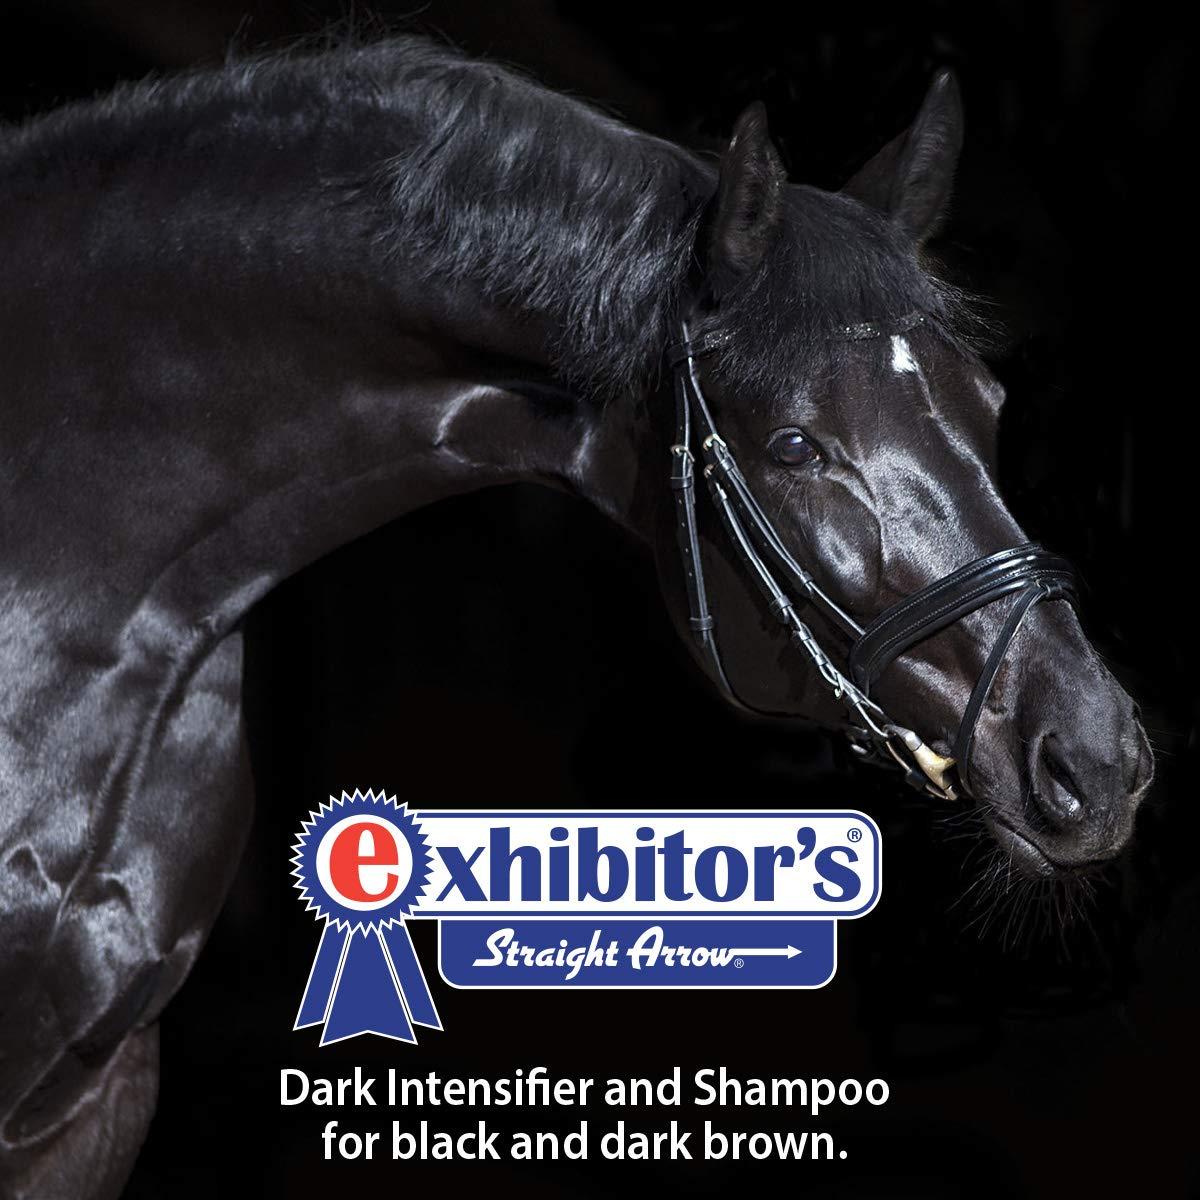 exhibitor's Quic Shampoo Quic Conditioner Plus Color Intensifiers (Quic Black Set) by exhibitor's (Image #4)